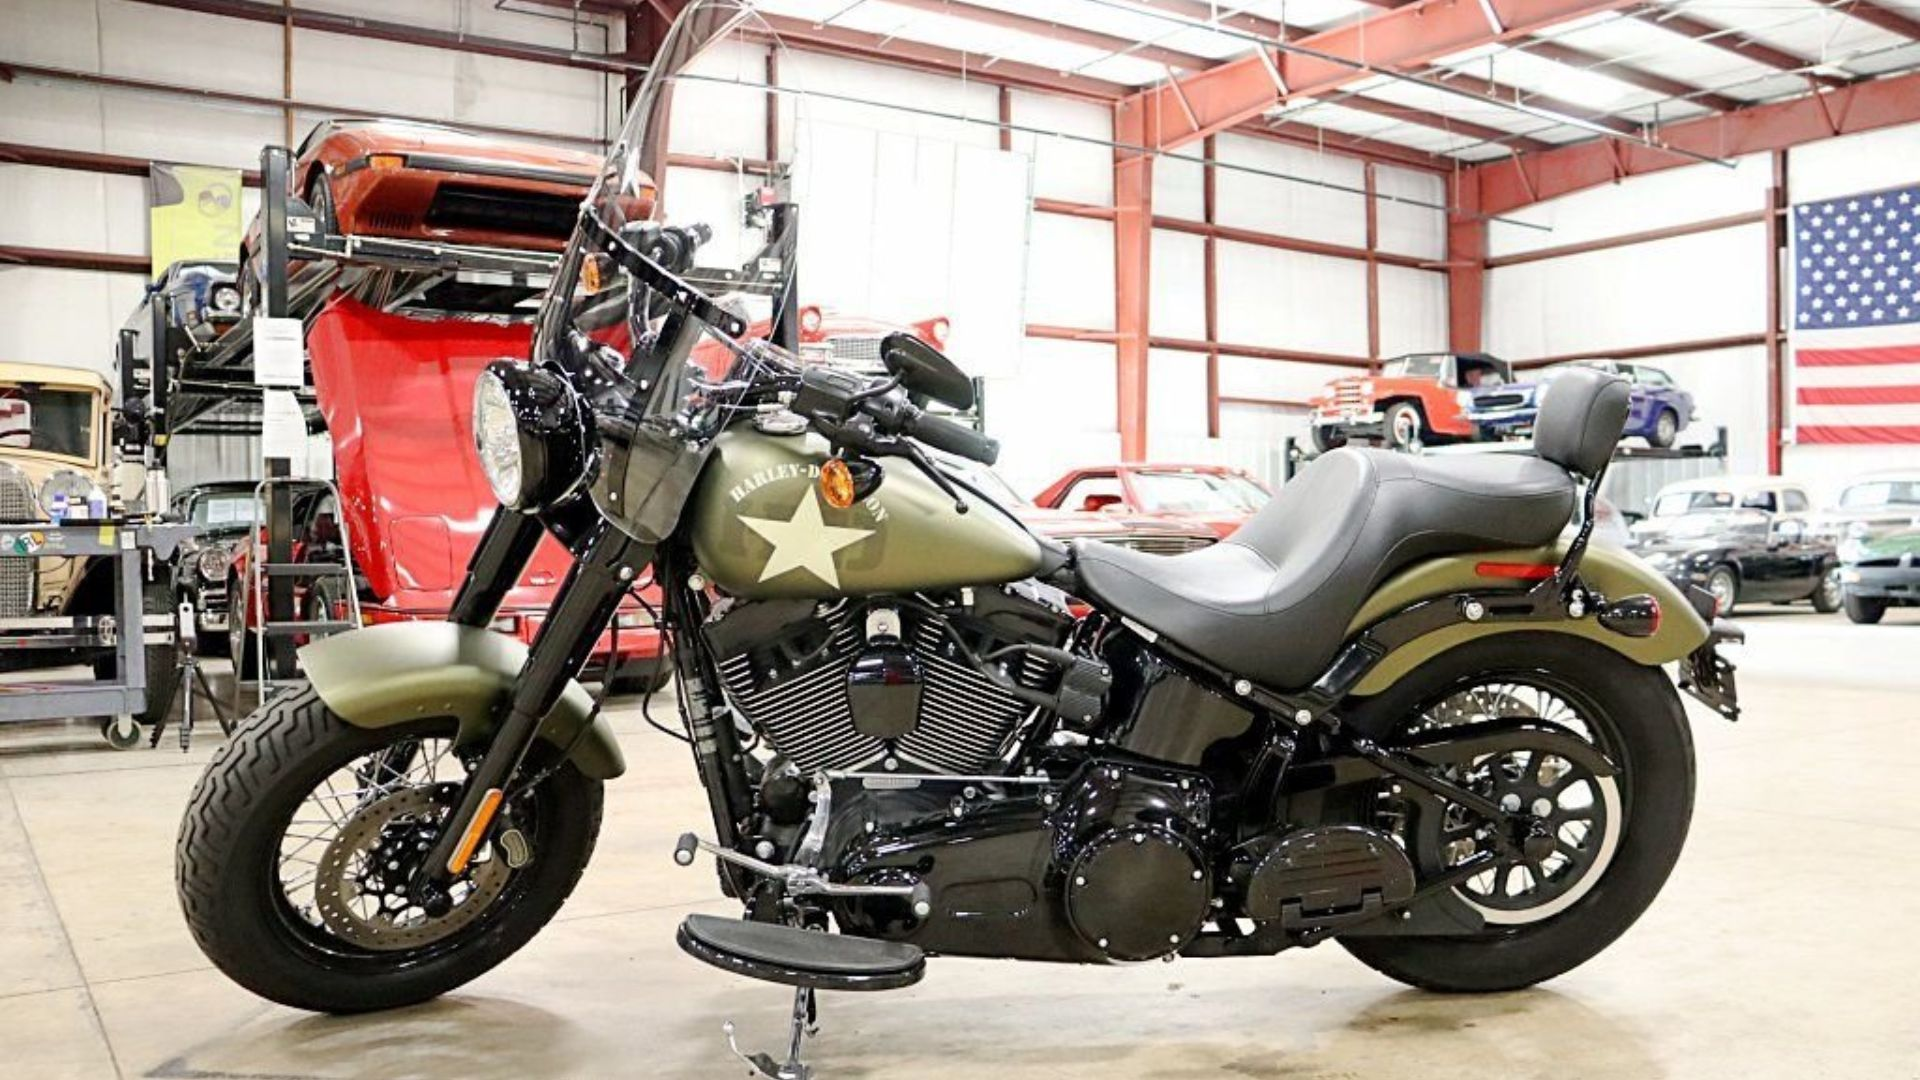 Motorcycle Monday: 2016 Harley-Davidson Softail Slim S